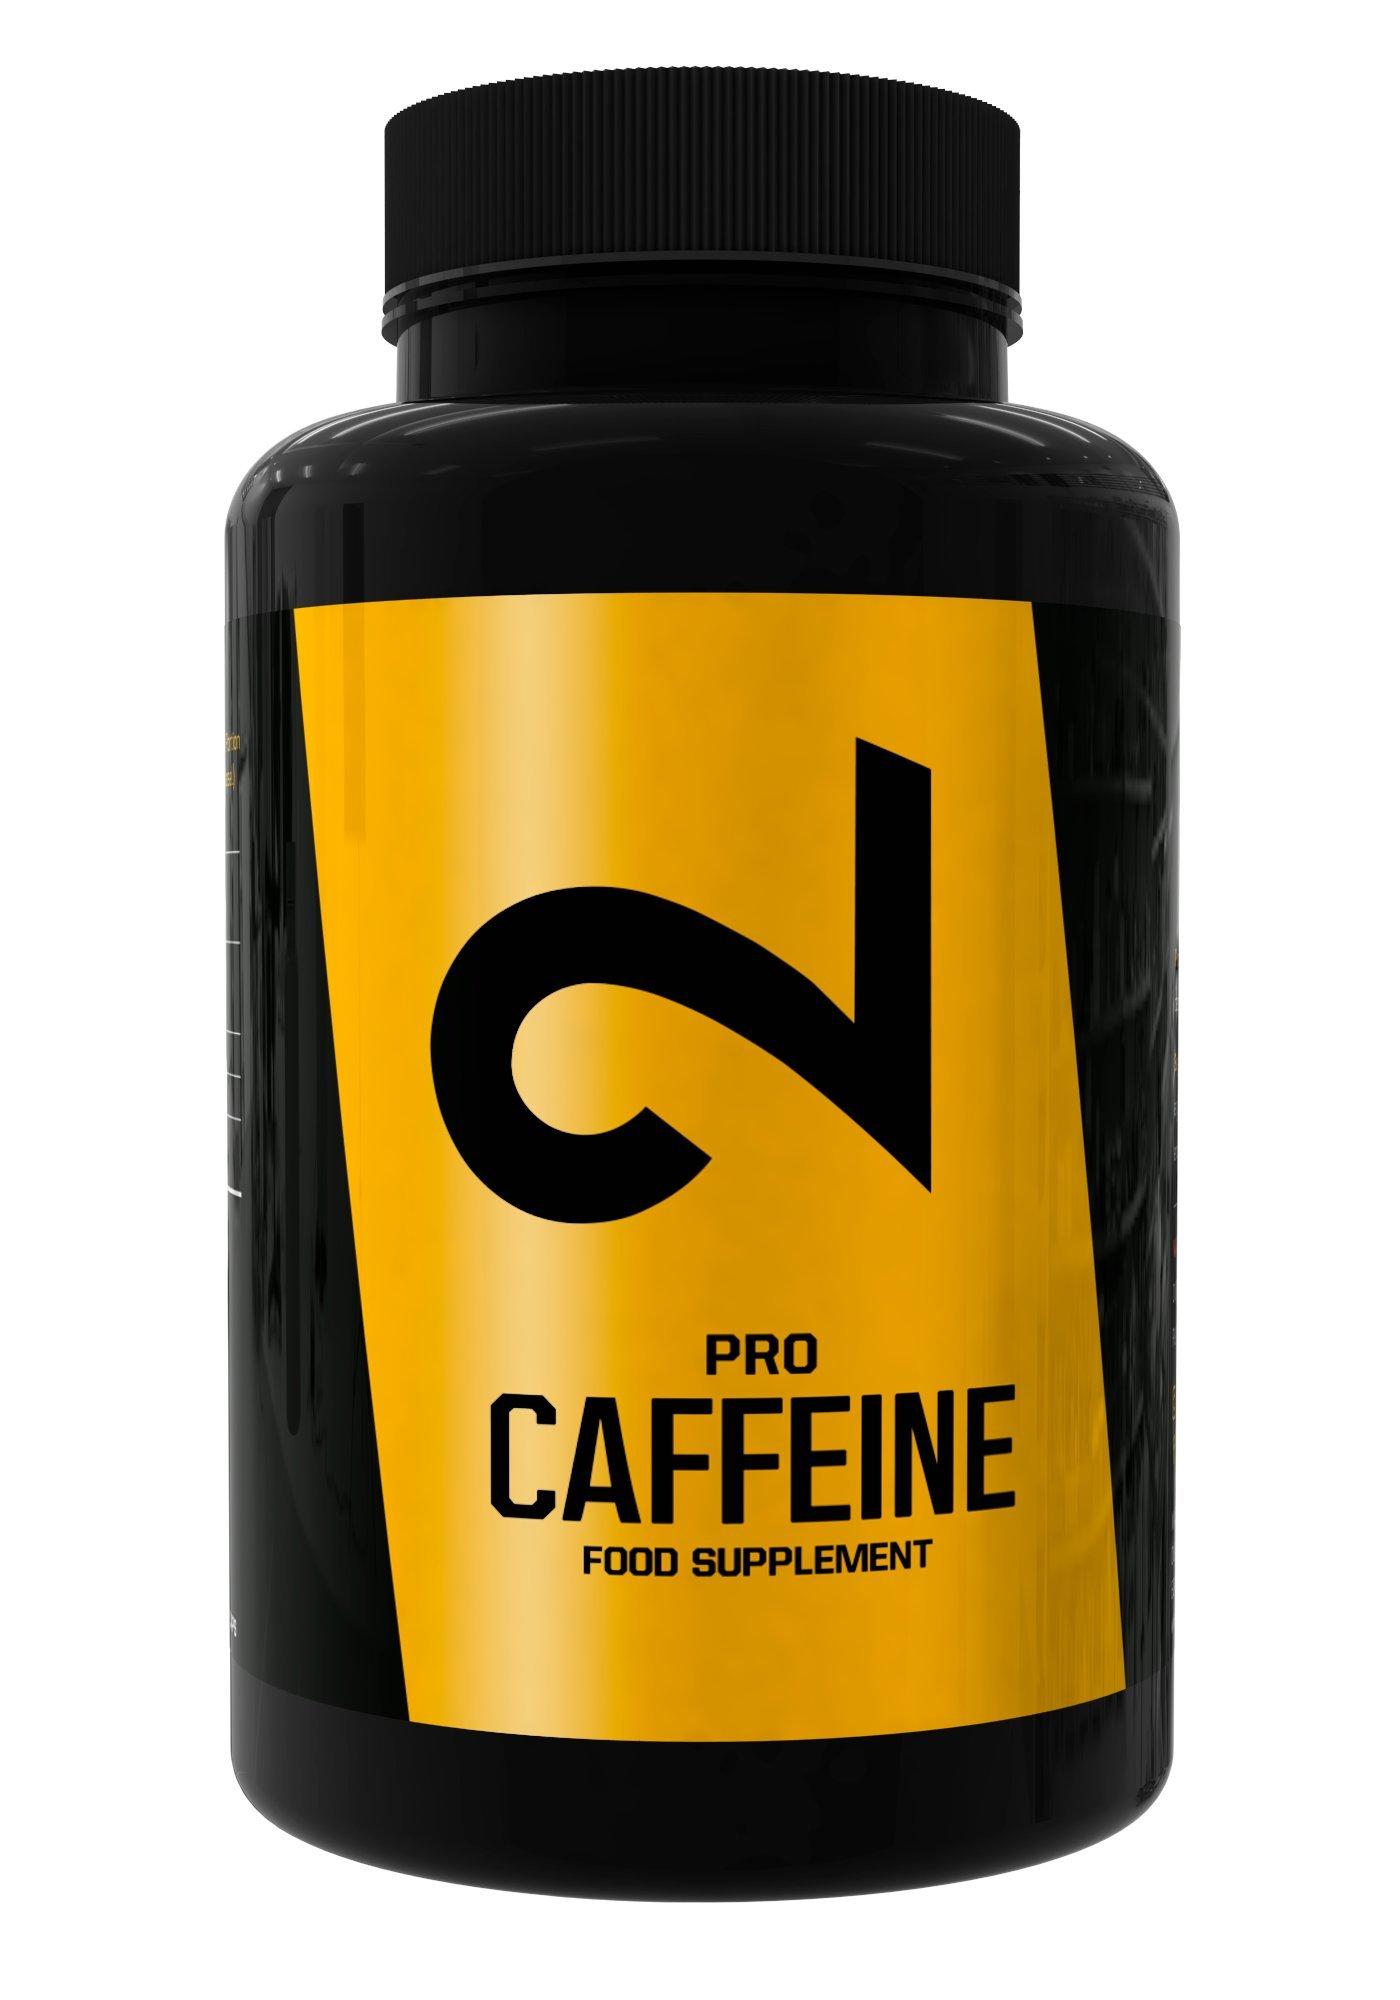 DUAL Pro CAFFEINE | Cafeína 100% Pura Certificada por Laboratorio | 120 Pastillas De Cafeína